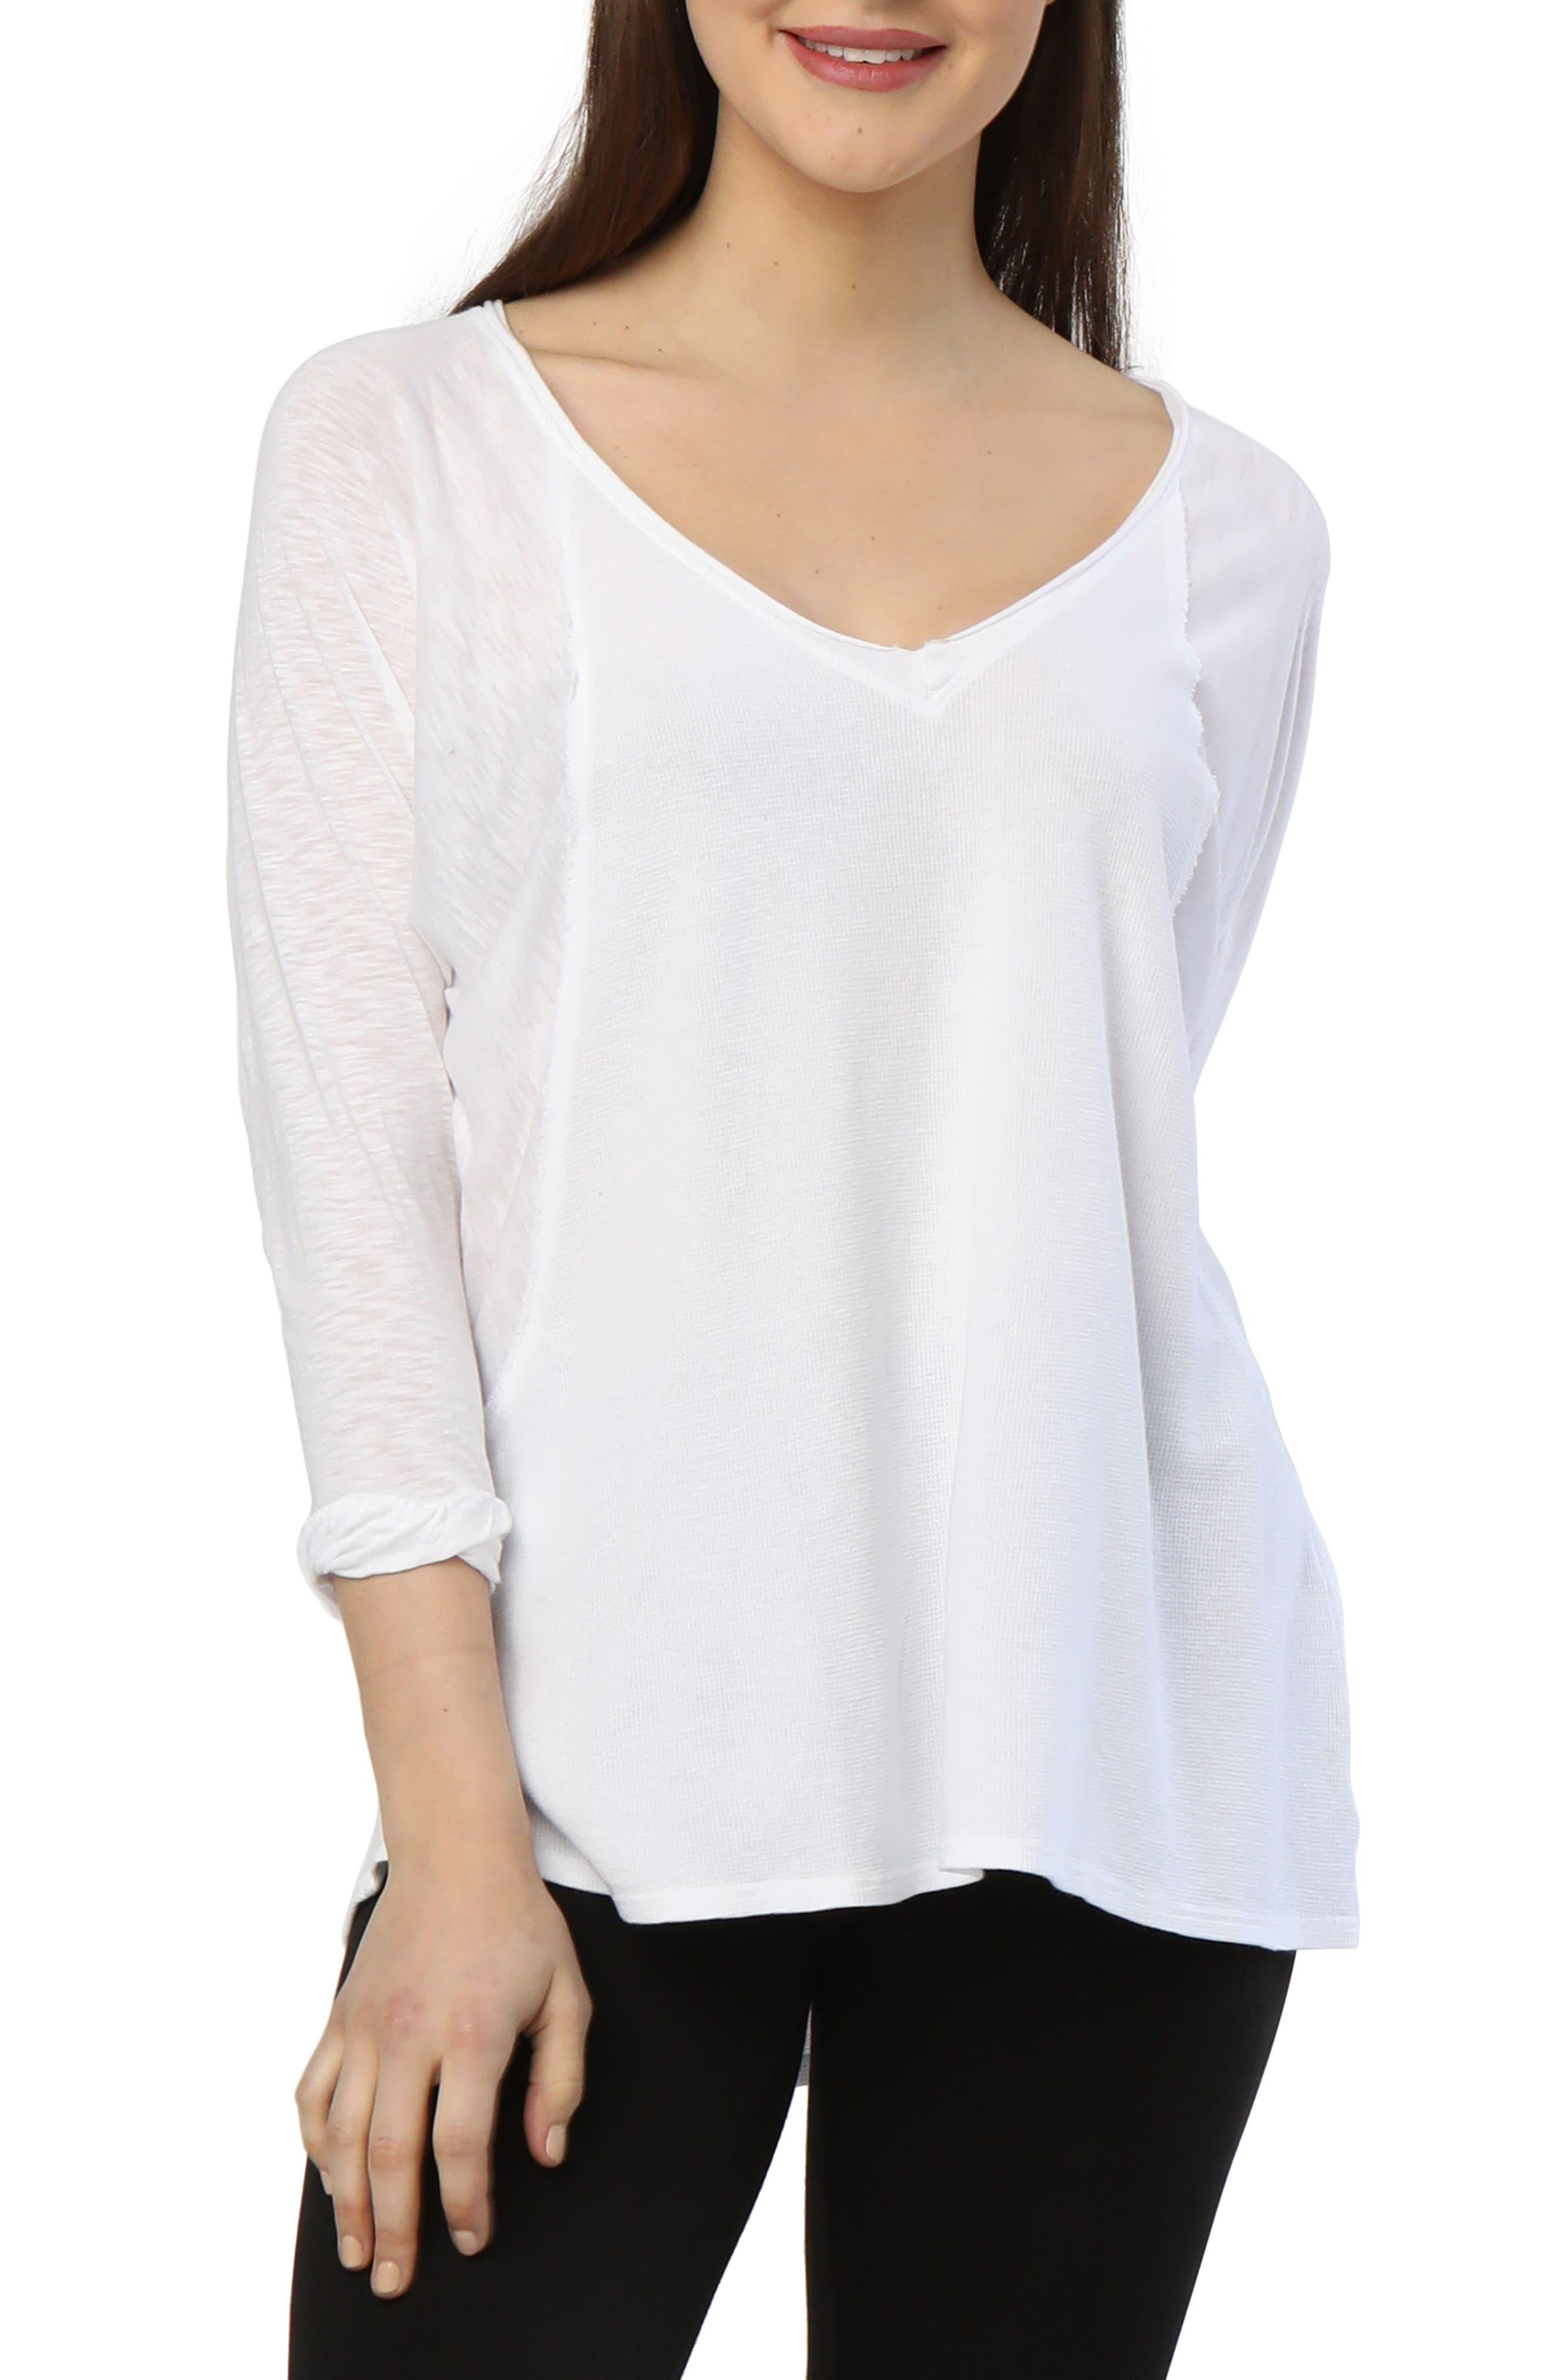 Kris Long-Sleeve Top,                         Main,                         color, White